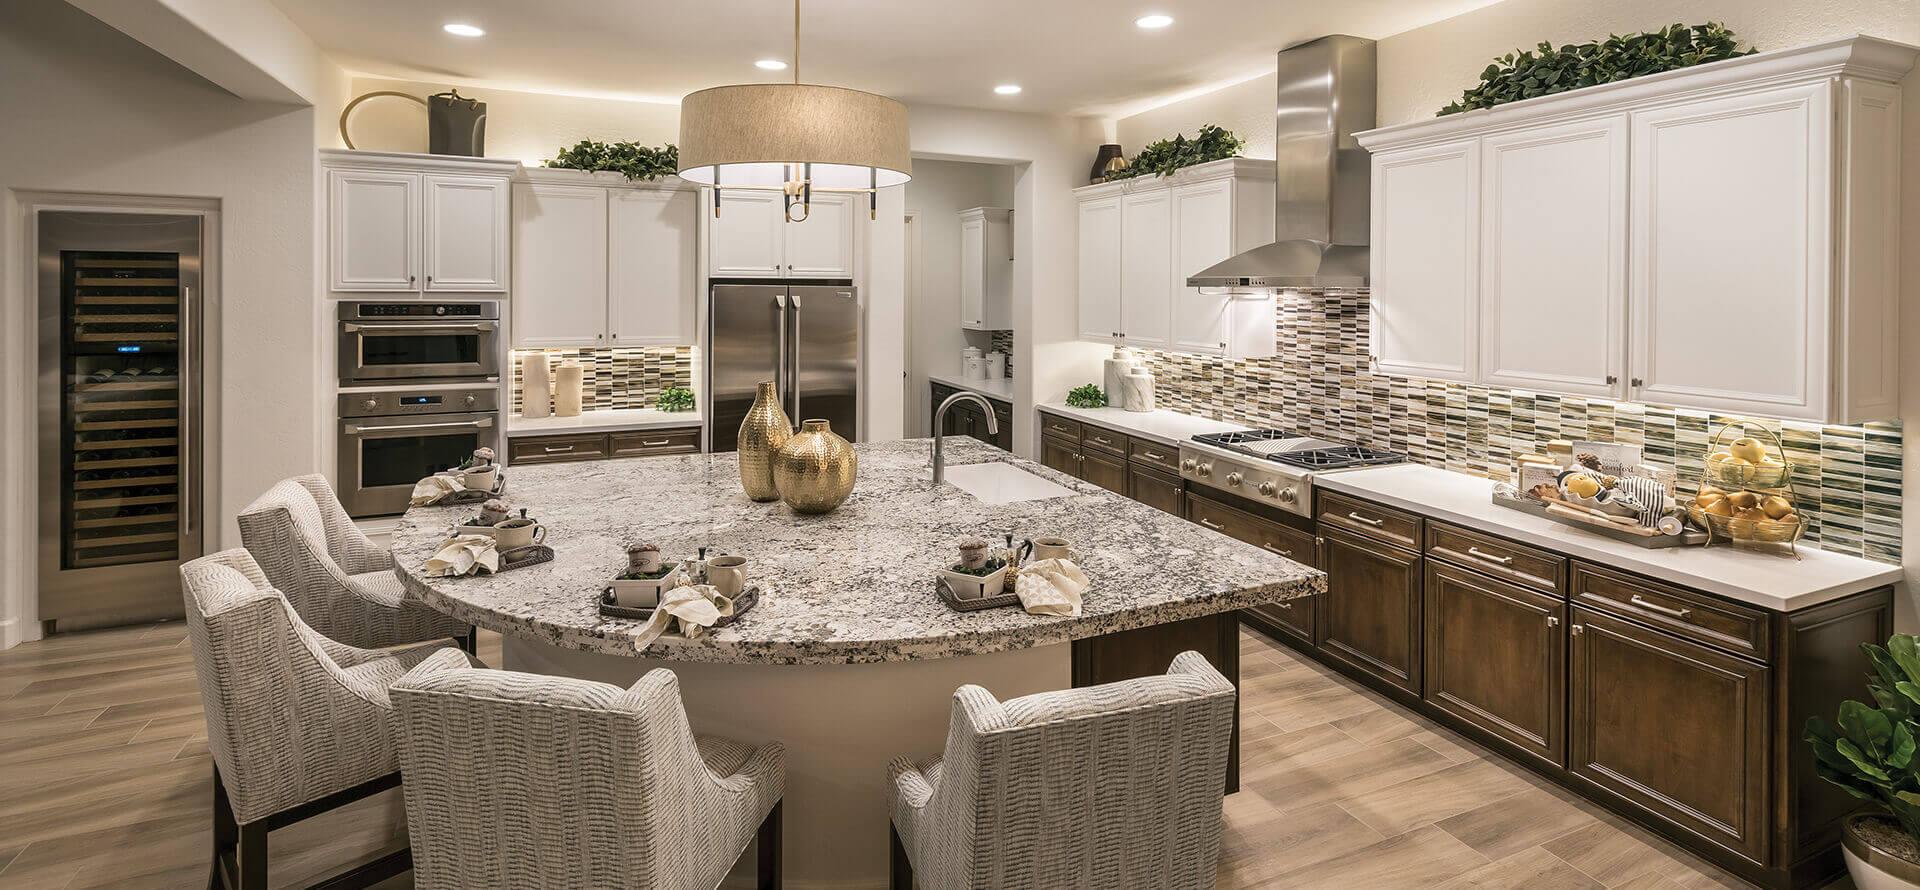 Bacara Model Kitchen at PebbleCreek, Arizona Luxury Retirement Living for Active Adults 55+